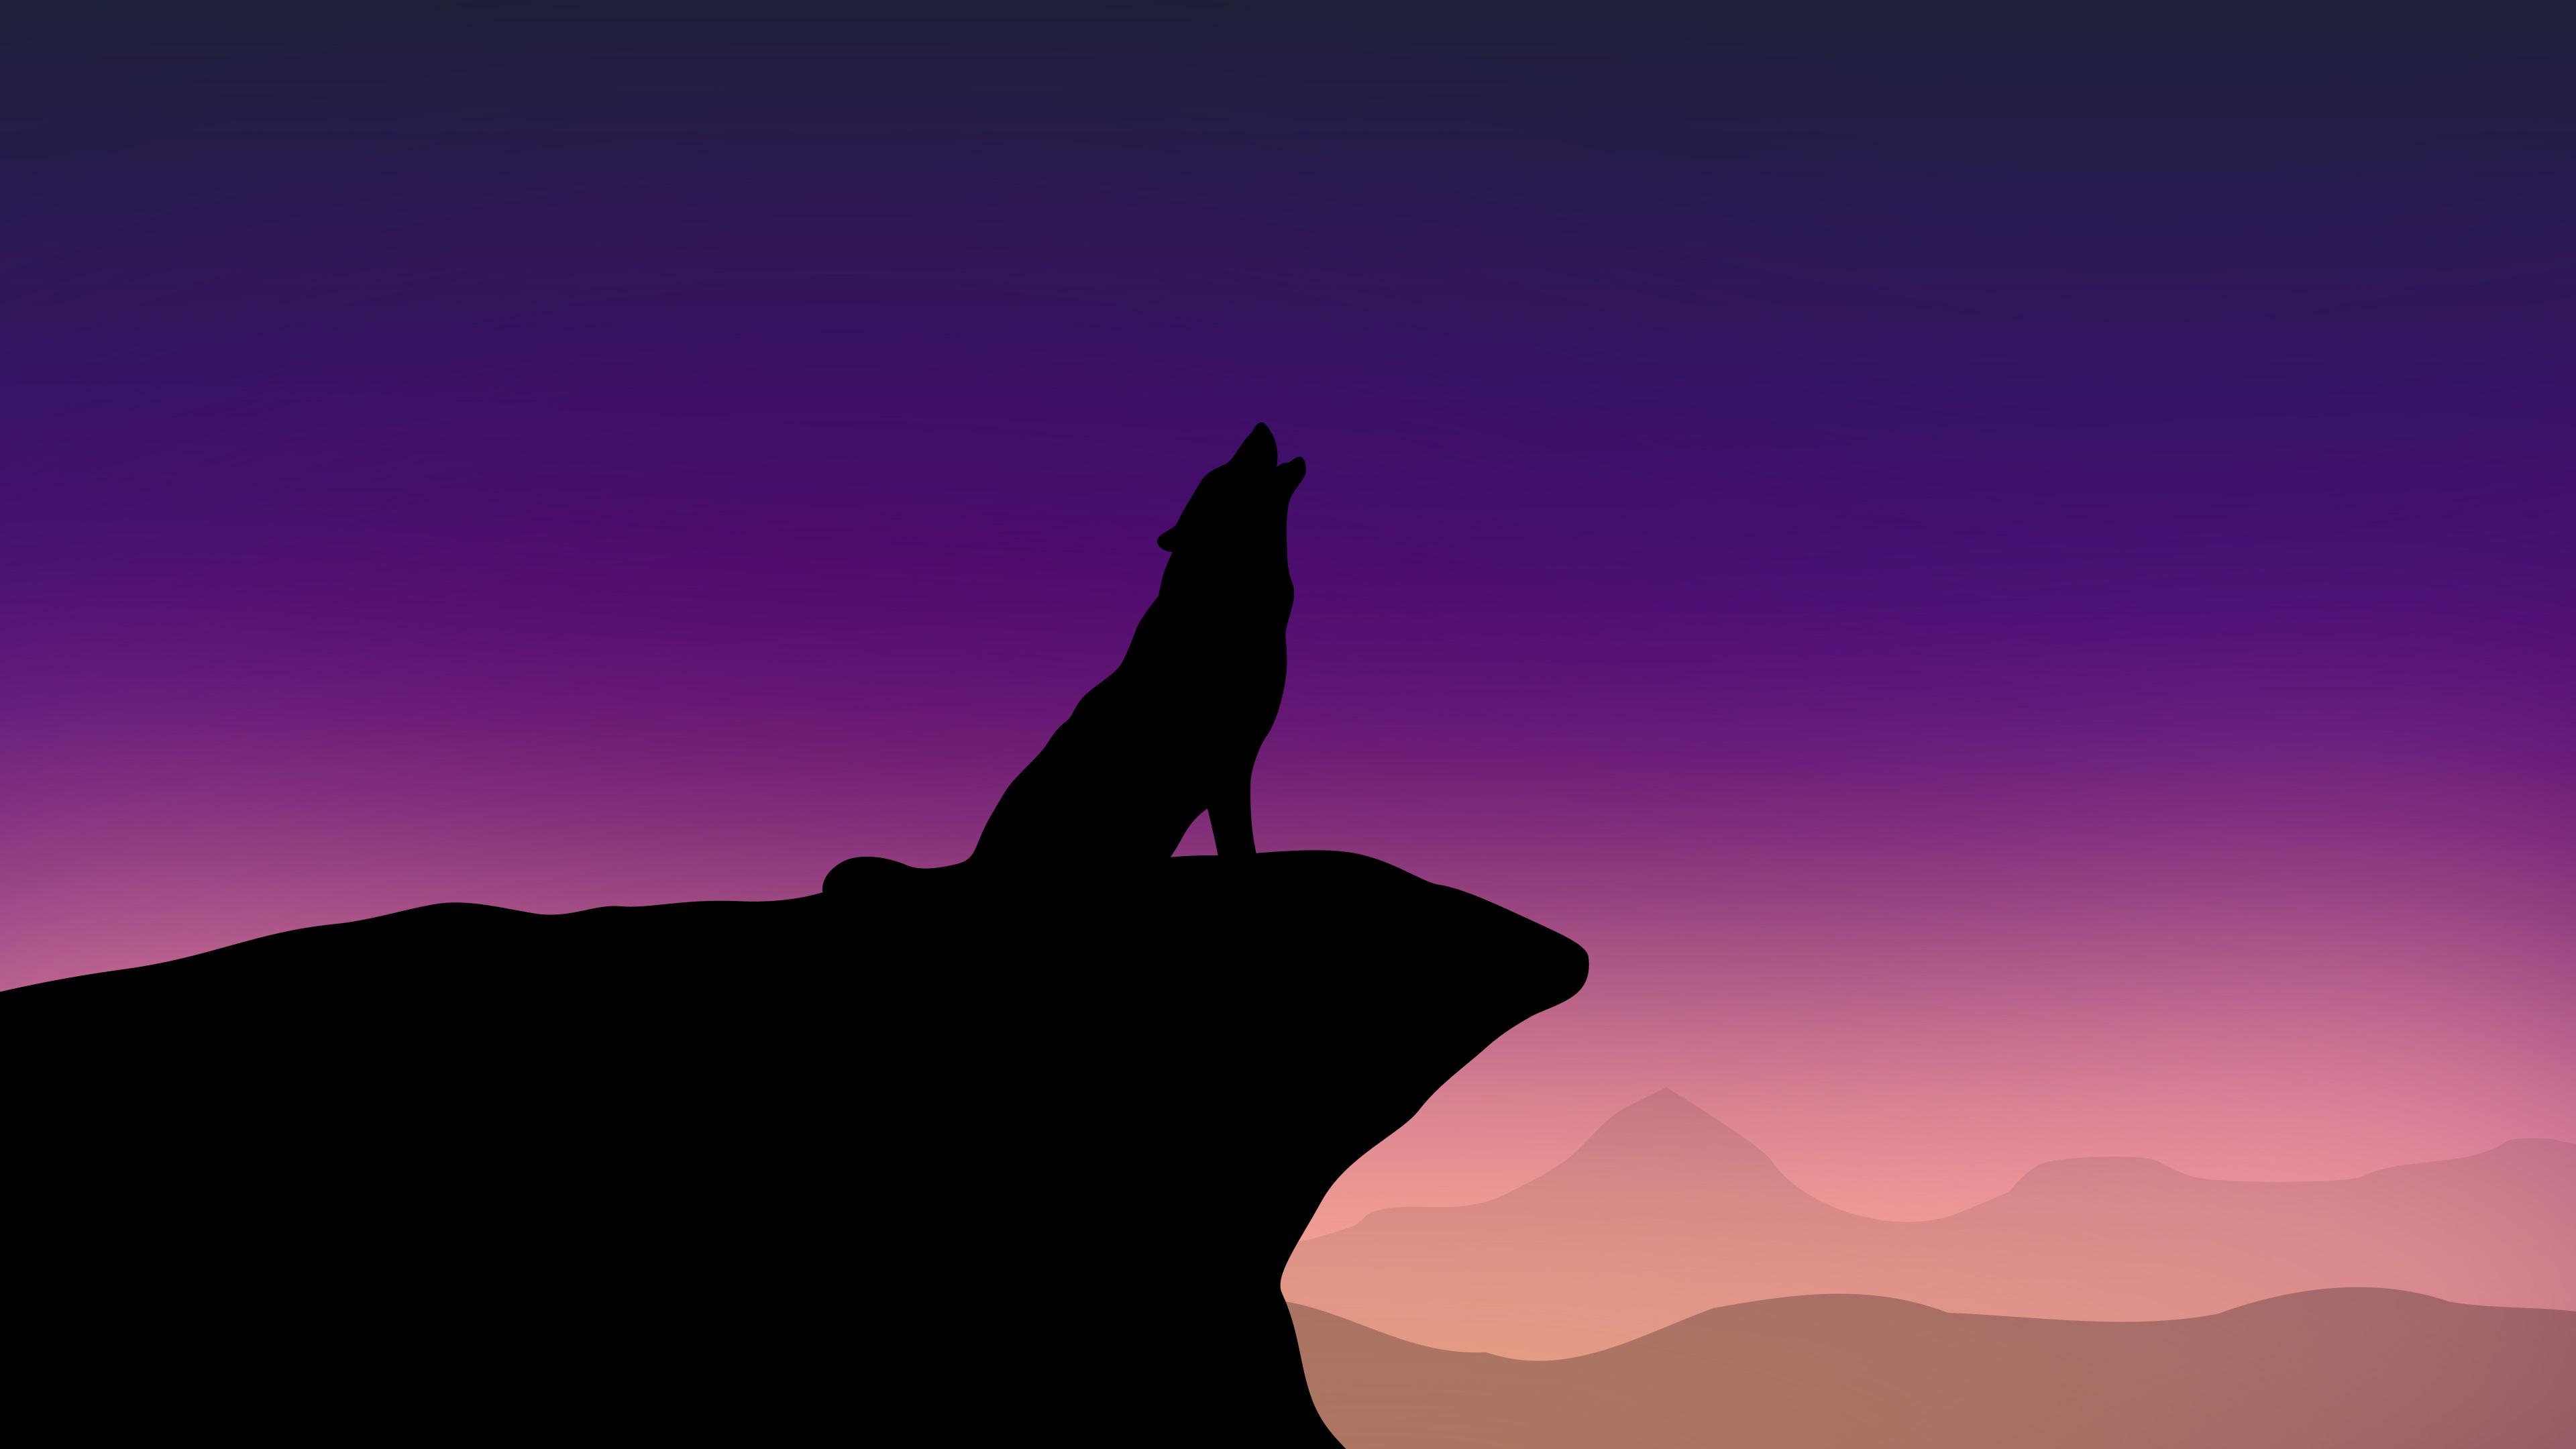 Sasuke Minimalista Fondo: Howling Wolf Minimalism 4k, HD Artist, 4k Wallpapers